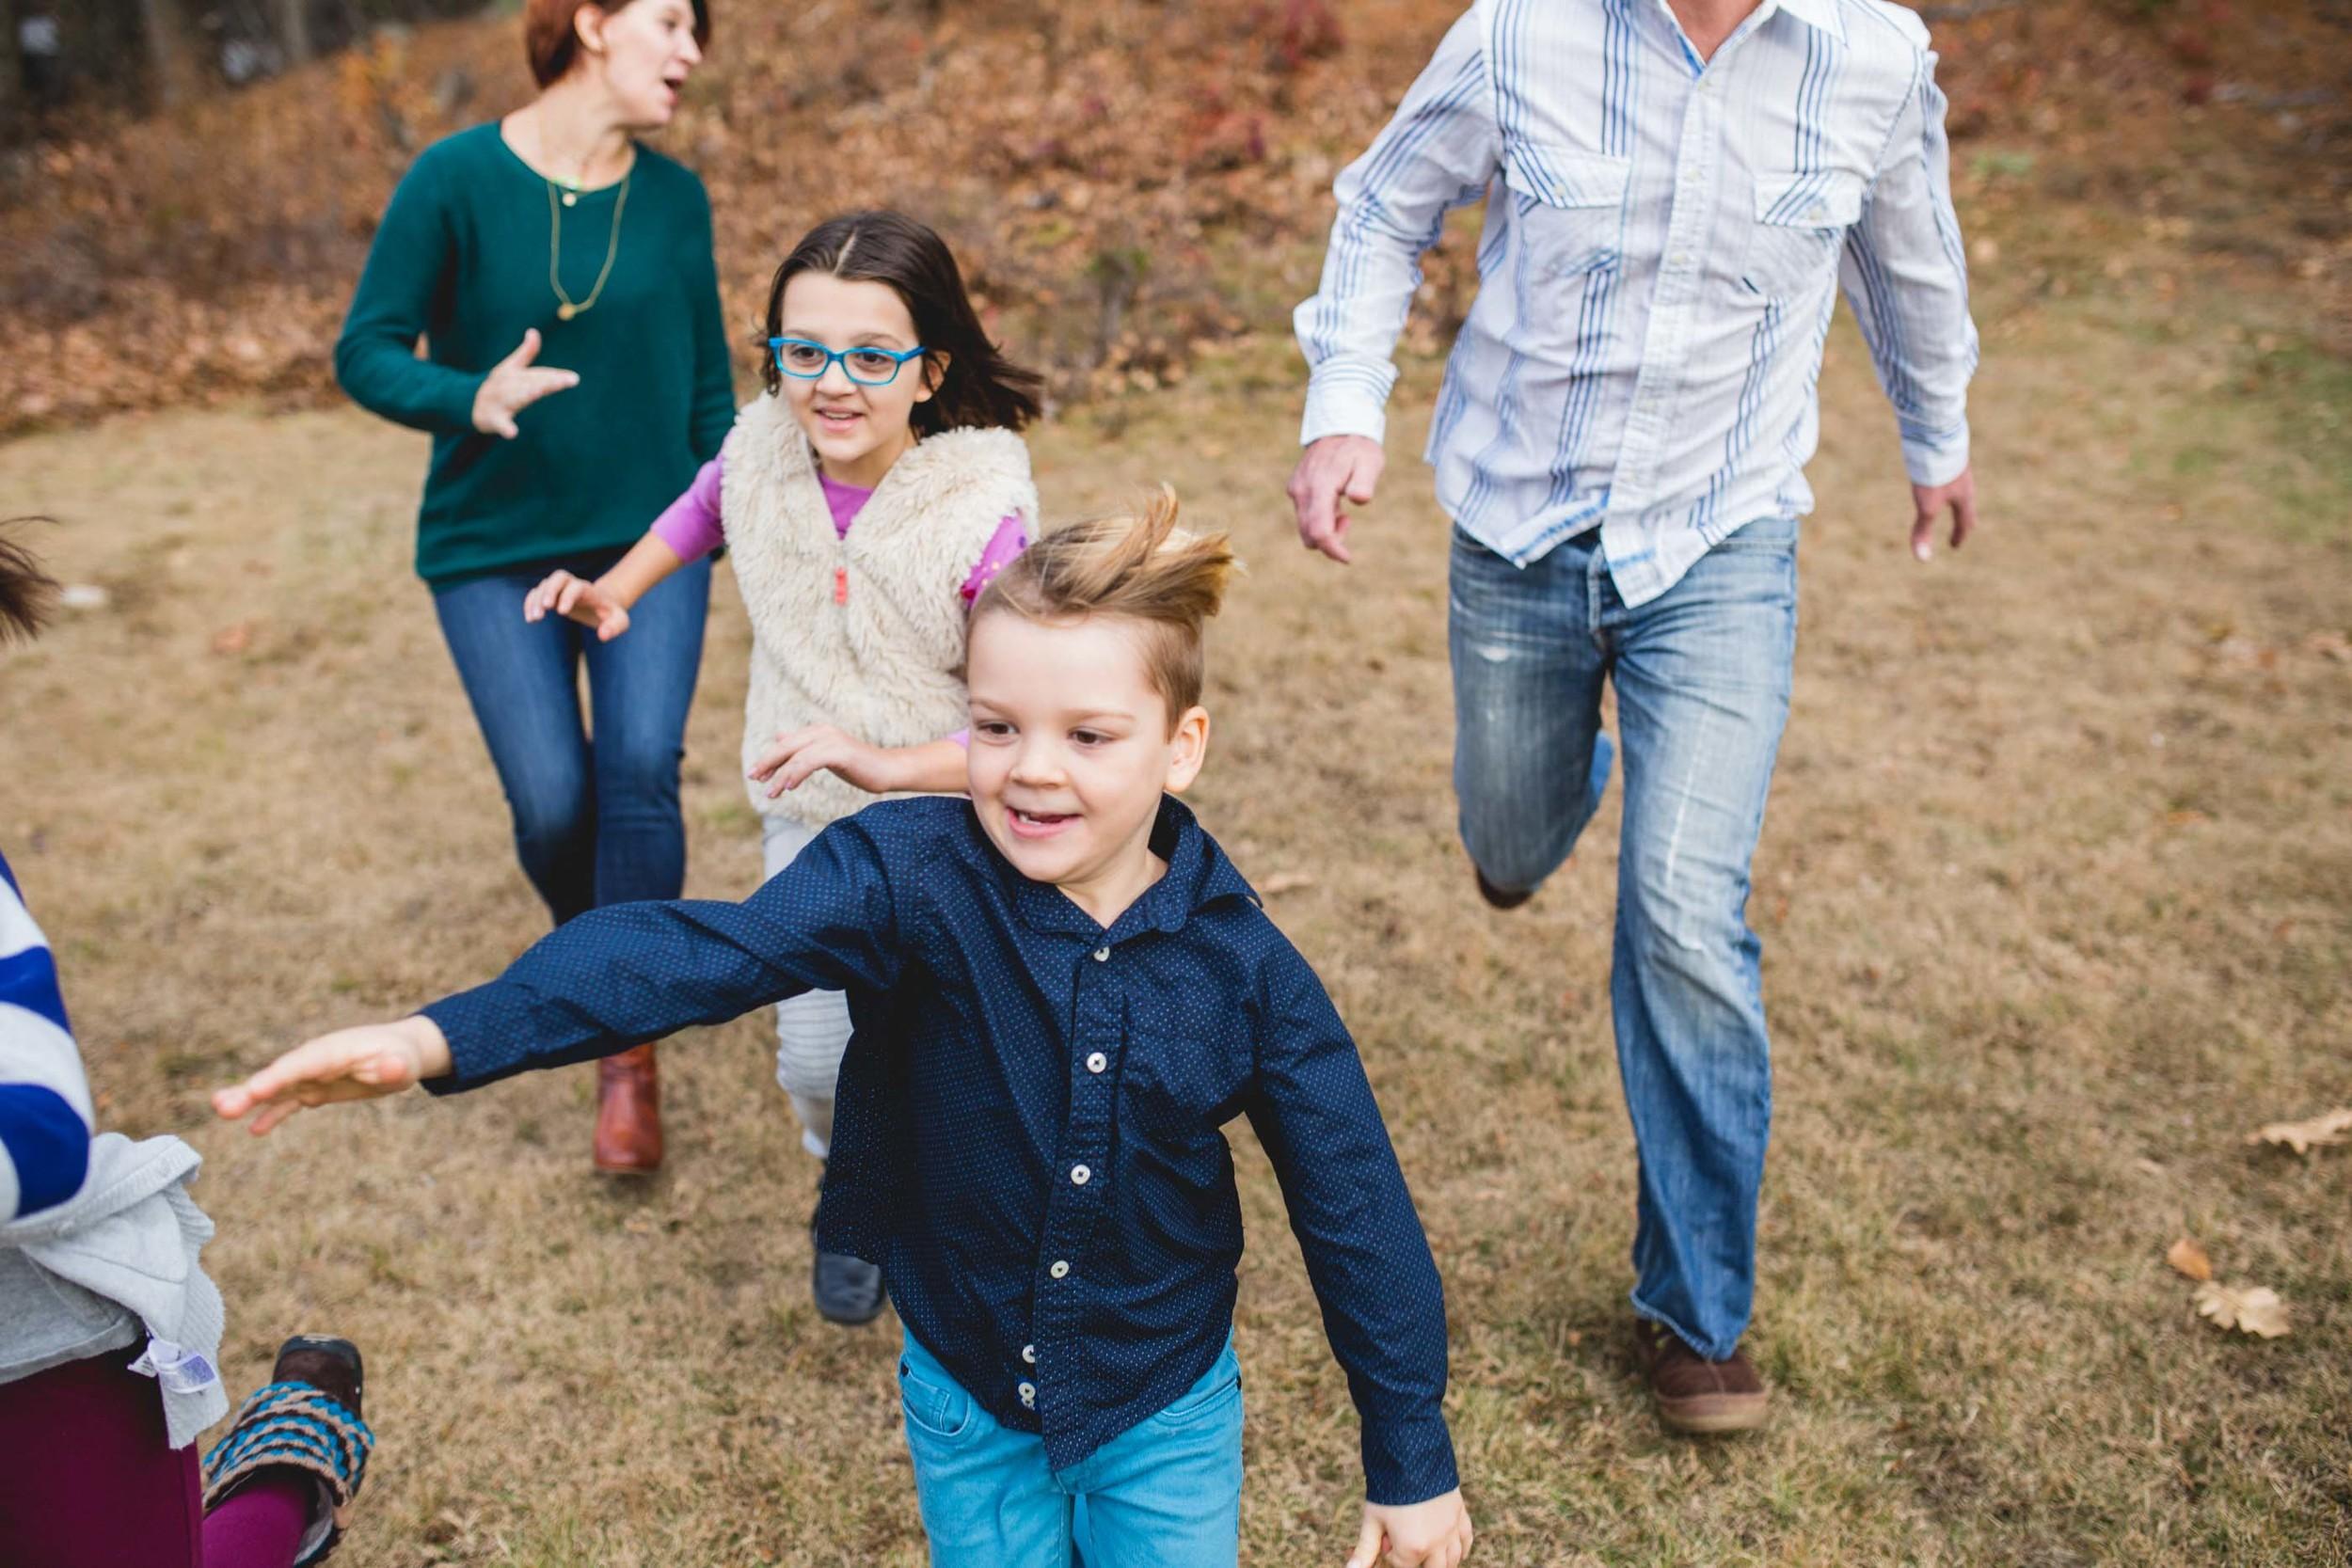 Family-Photographer-Beverly-MA-2-2.jpg